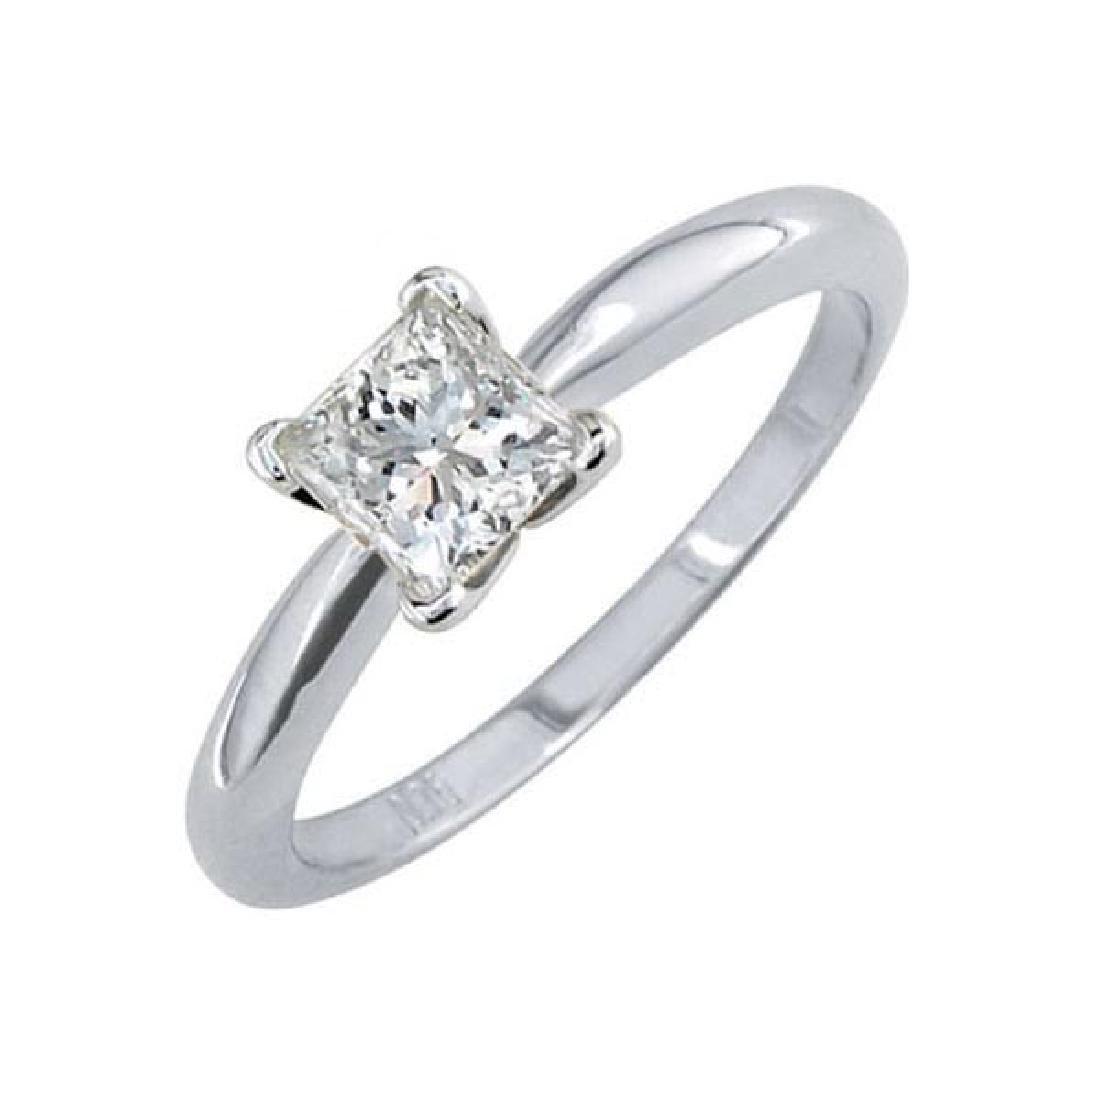 Certified 0.9 CTW Princess Diamond Solitaire 14k Ring K